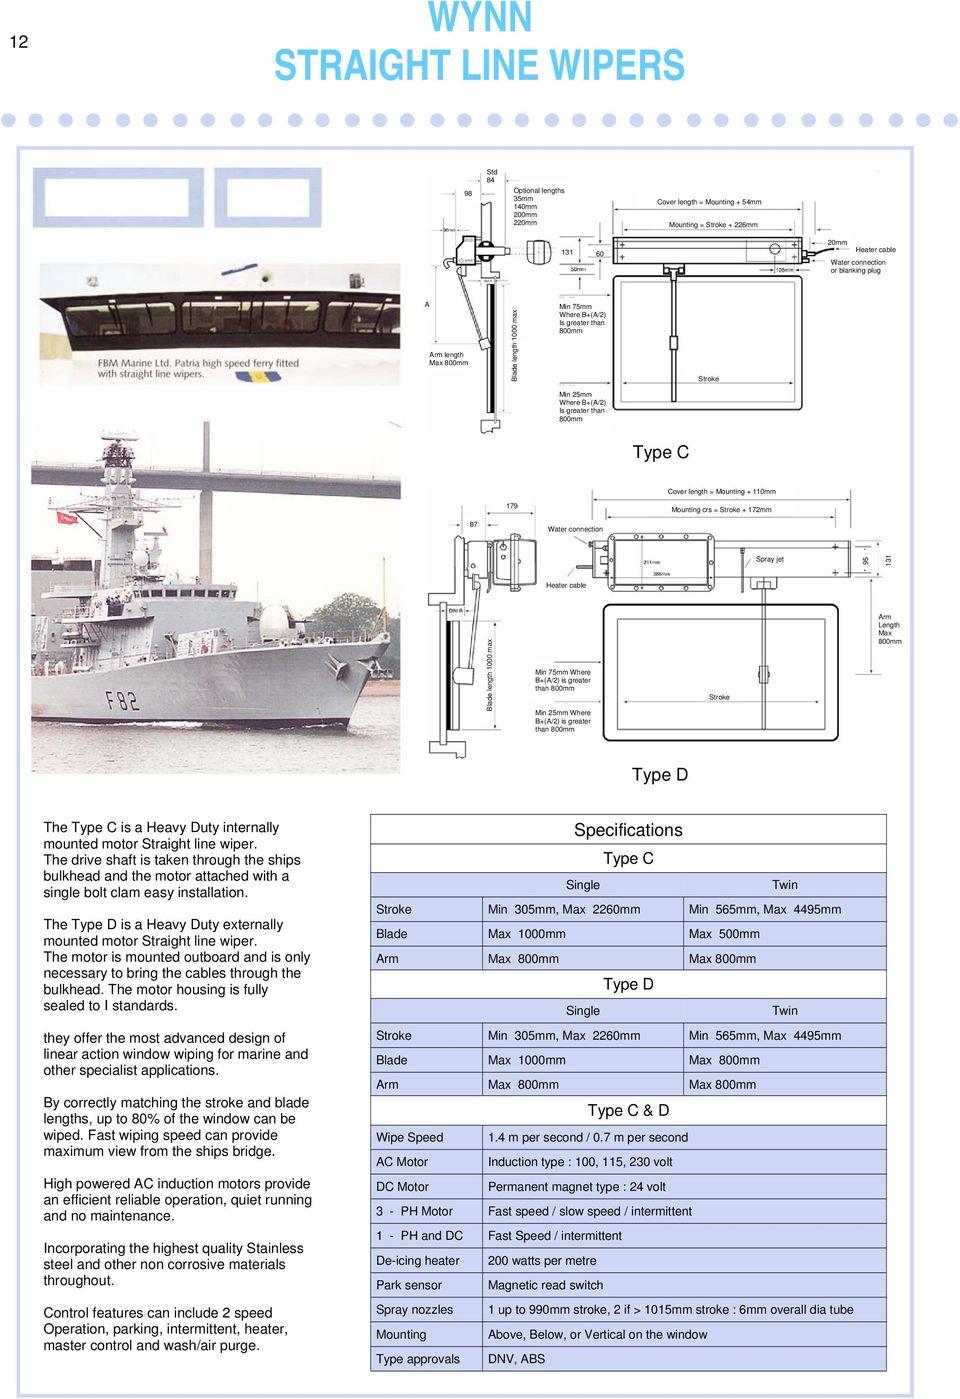 medium resolution of boat windshield wiper motor wiring diagram boat afi marine wiper motor wiring diagram wiring diagram and